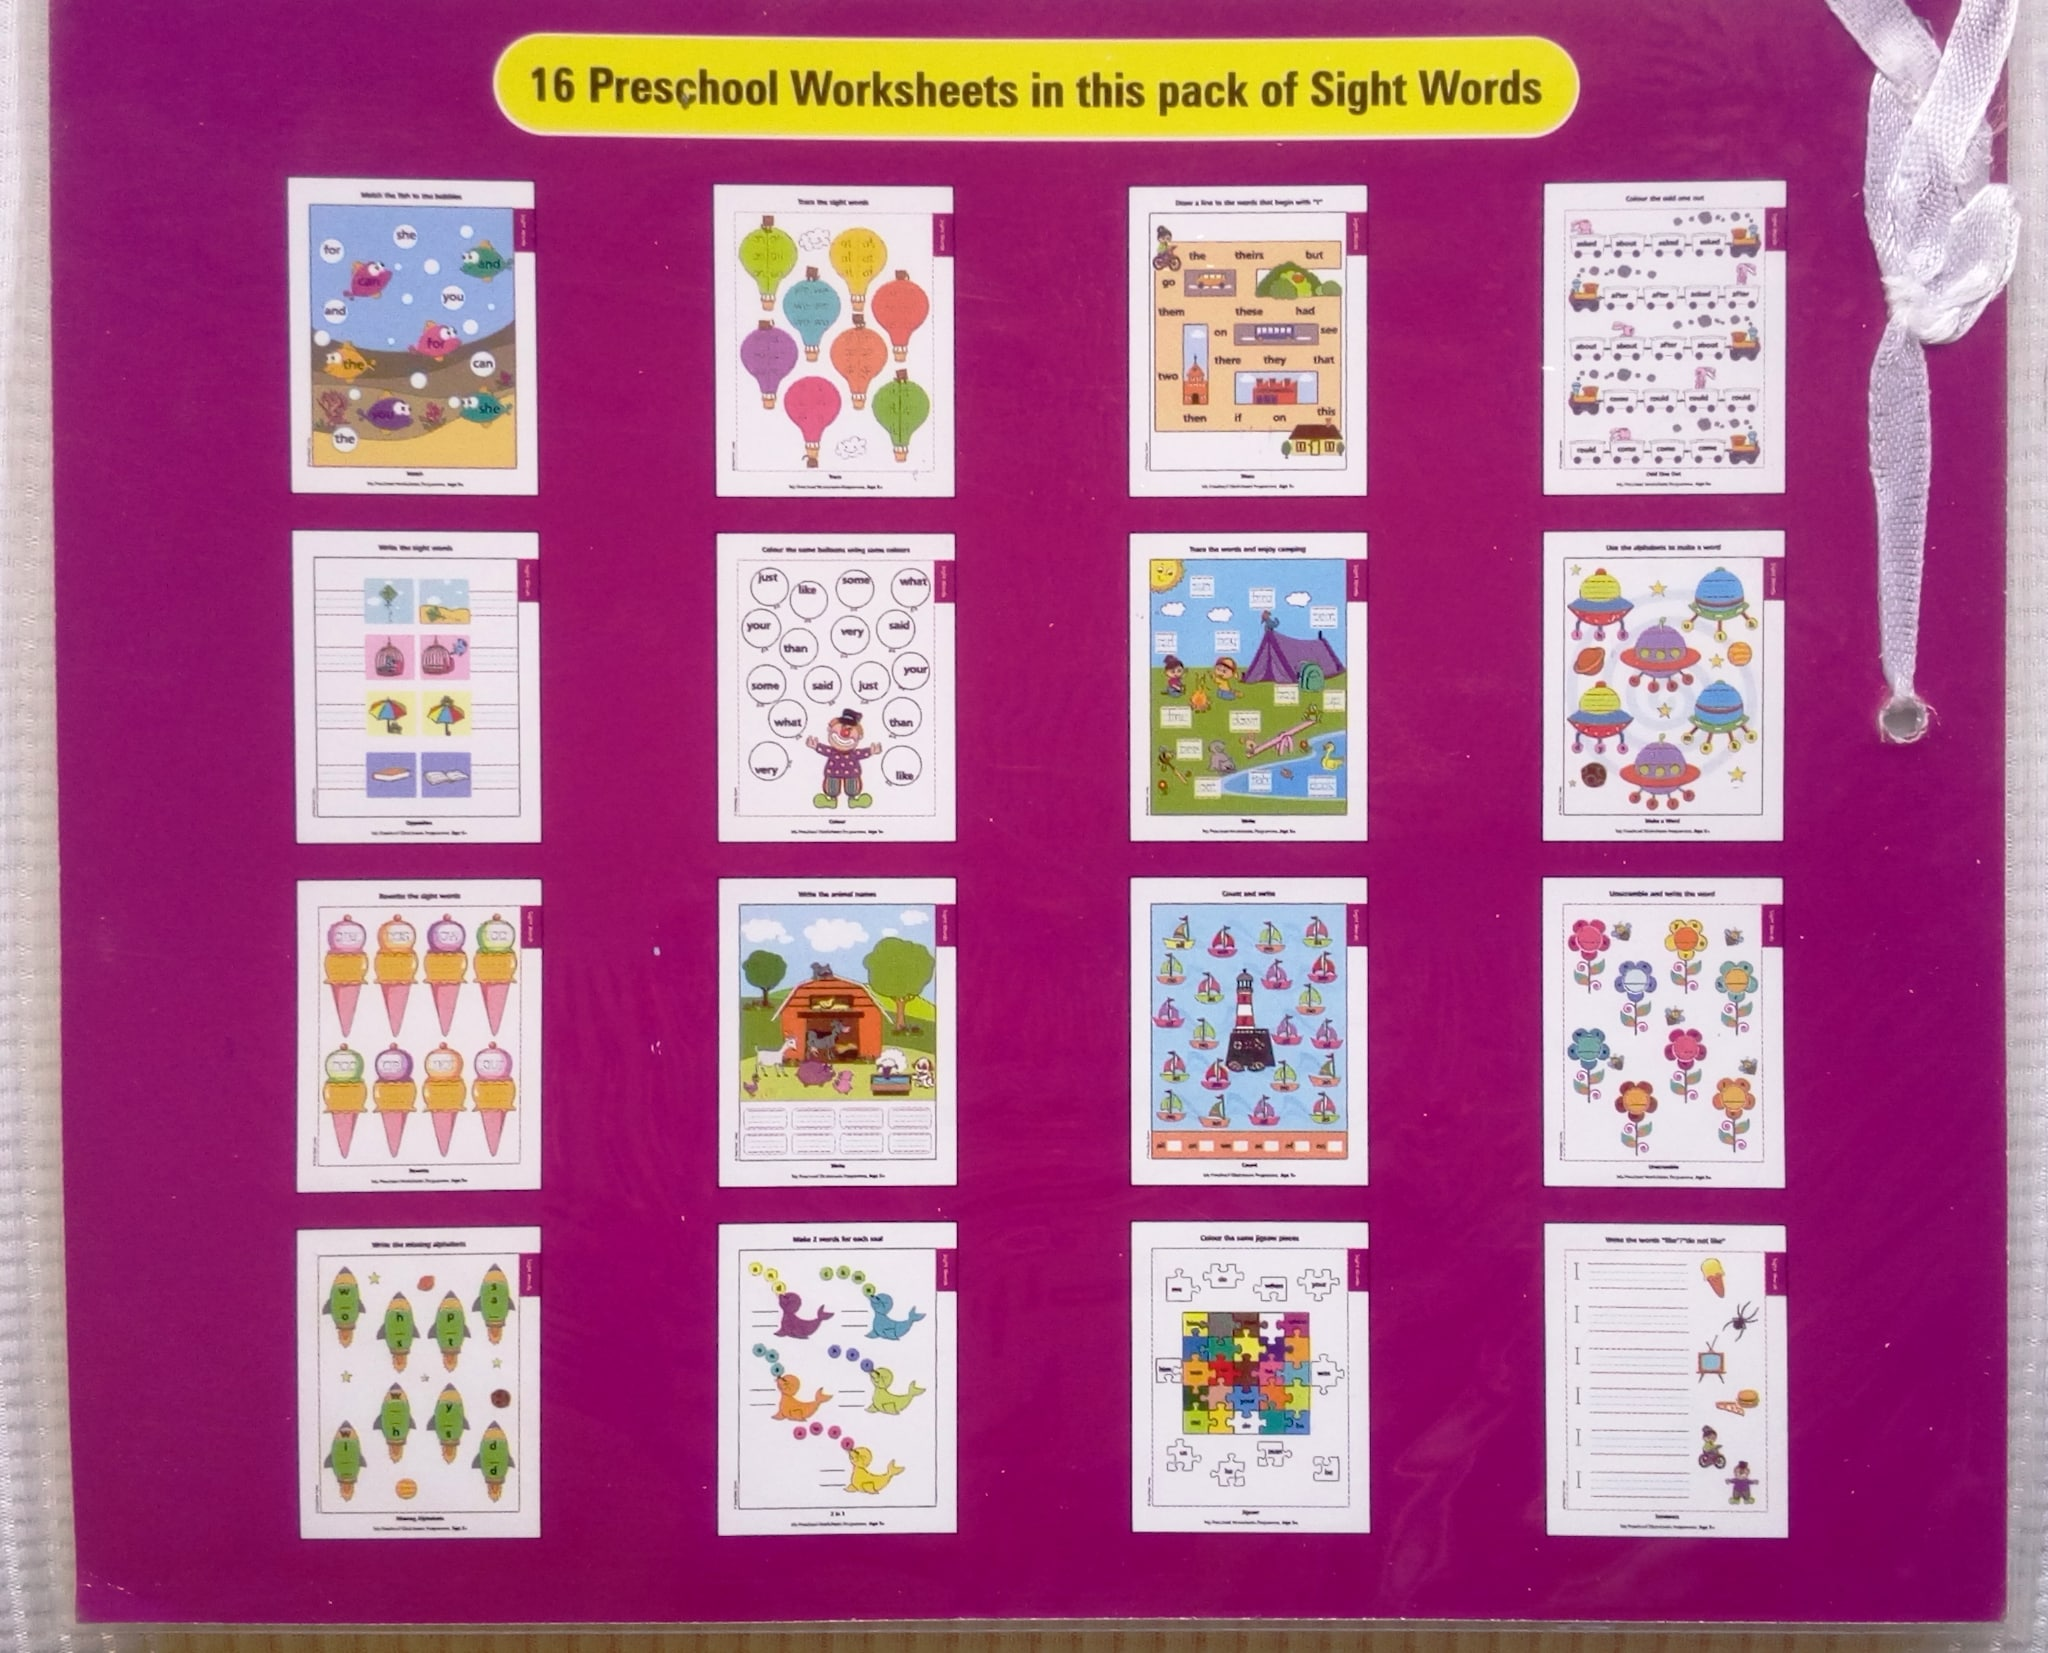 My Preschool Worksheets Sight Words Level 3 (Age 5+)